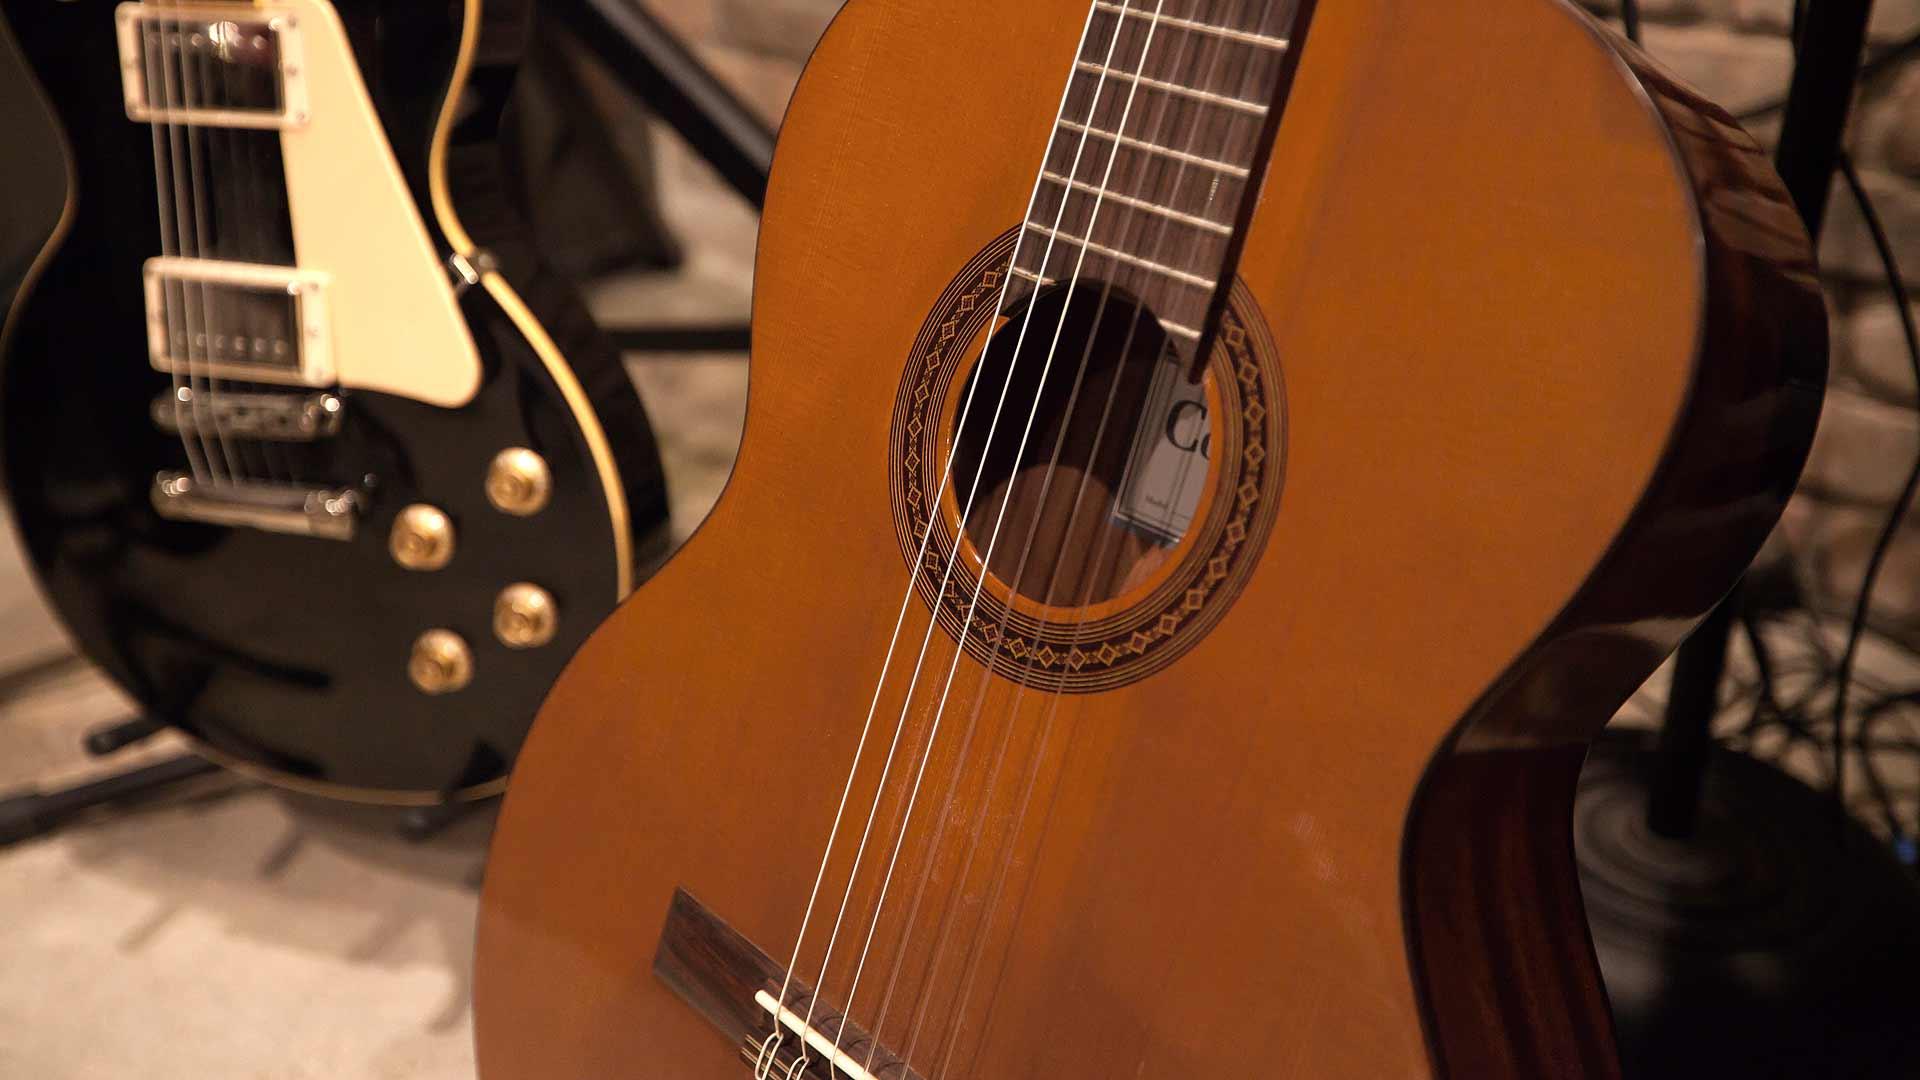 Guitar Detail - Minimalist Modern - Indian Head Park - Chicago, Illinois - HAUS   Architecture For Modern Lifestyles, Christopher Short, Indianapolis Architect with Joe Trojanowski